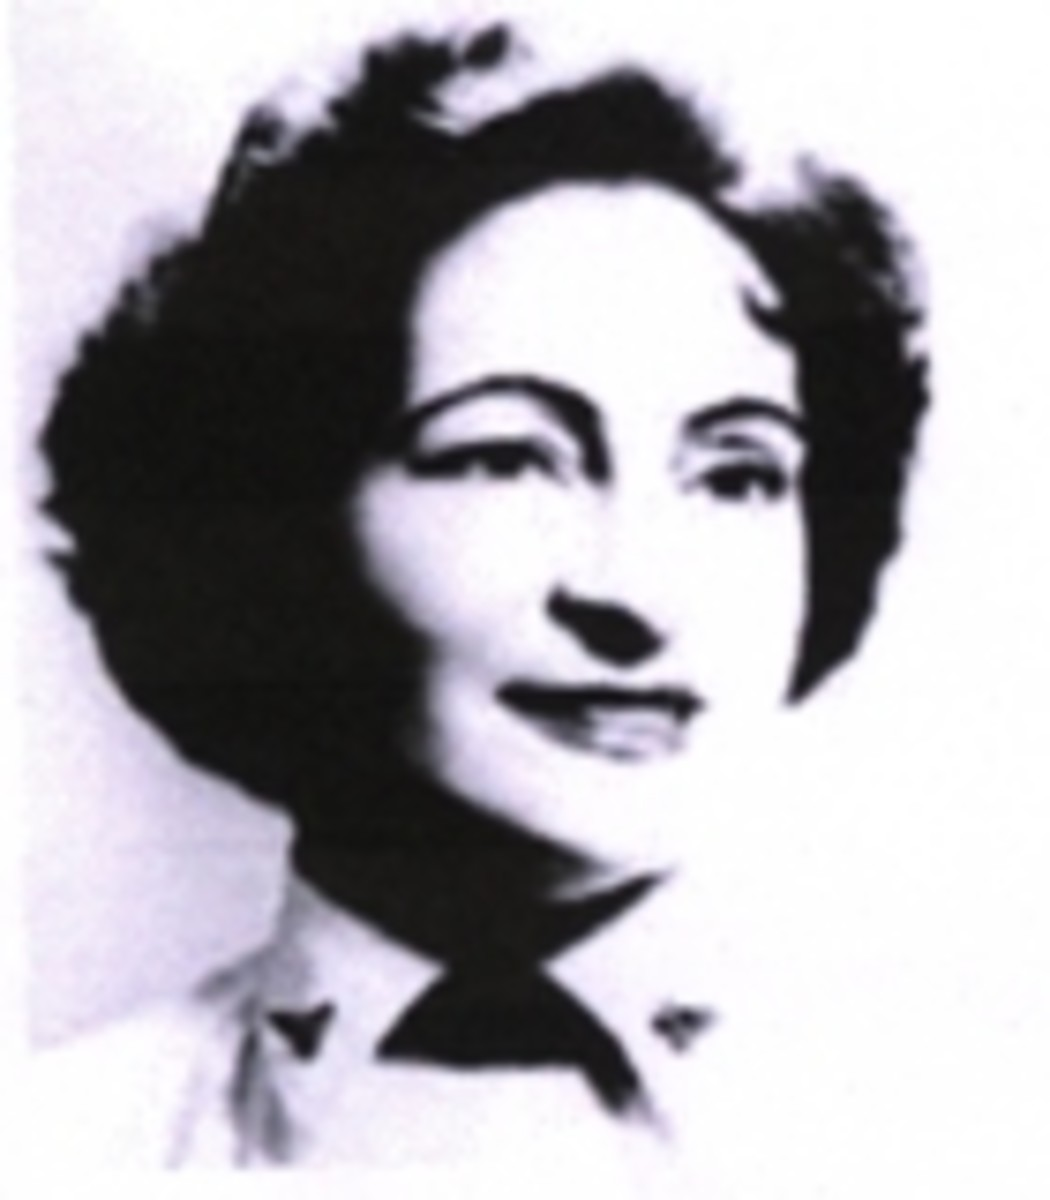 Ada Rogato (Dec. 22, 1920 - Nov. 17, 1986)